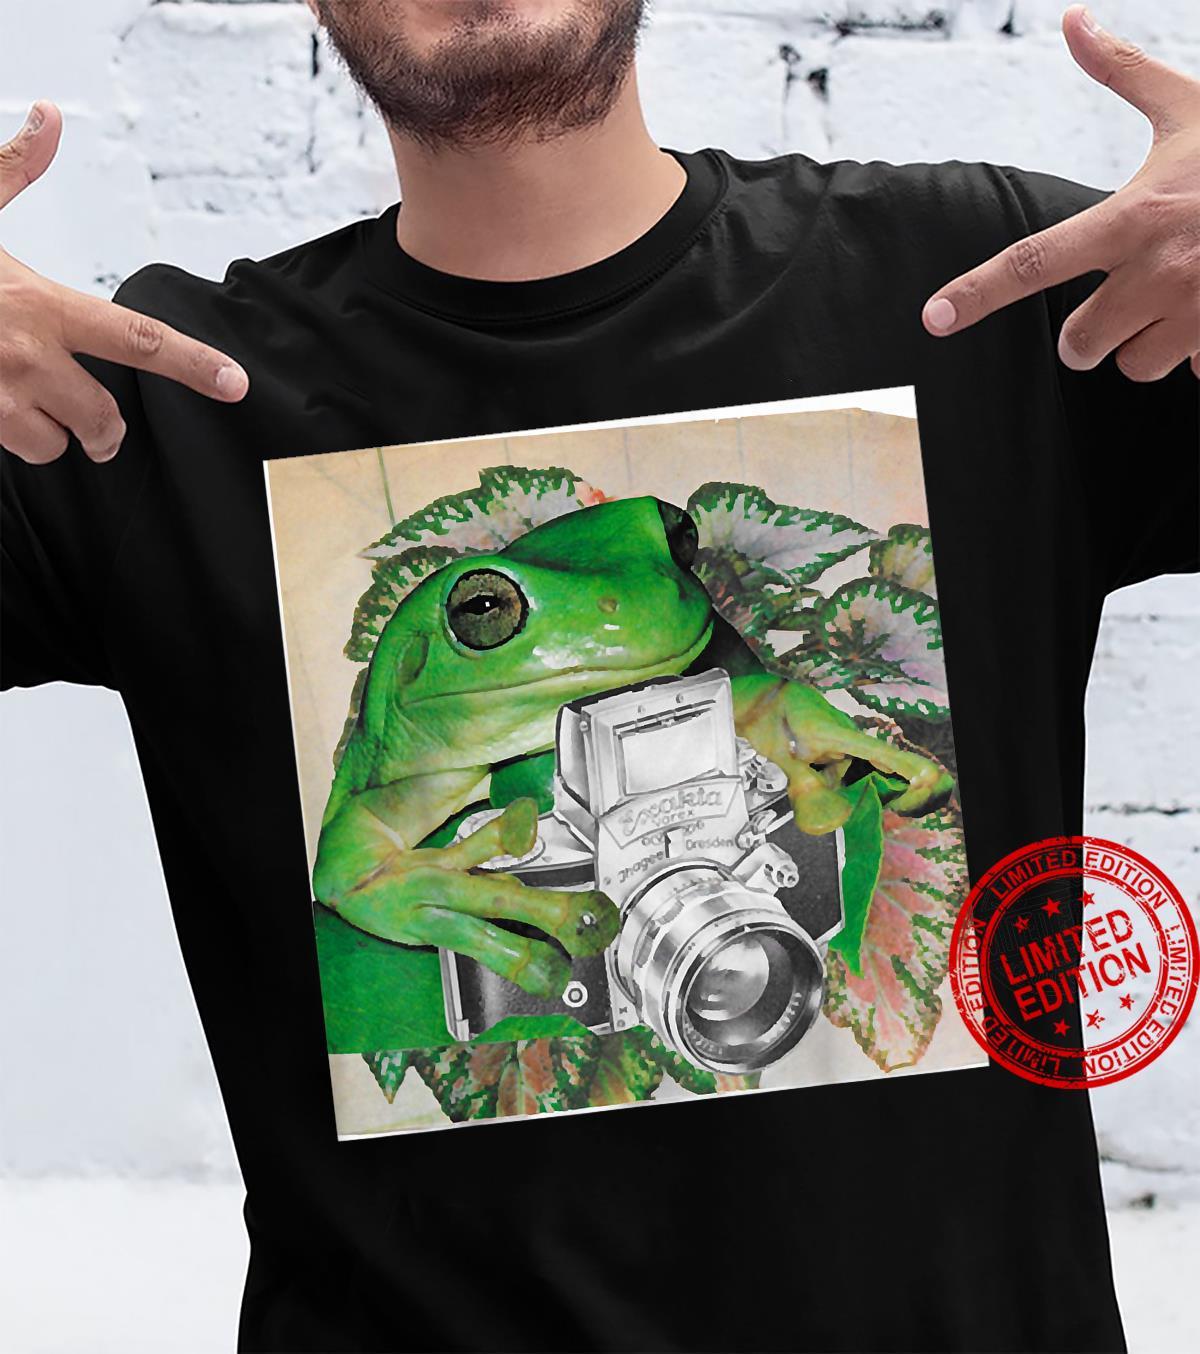 Says Worm Shirt